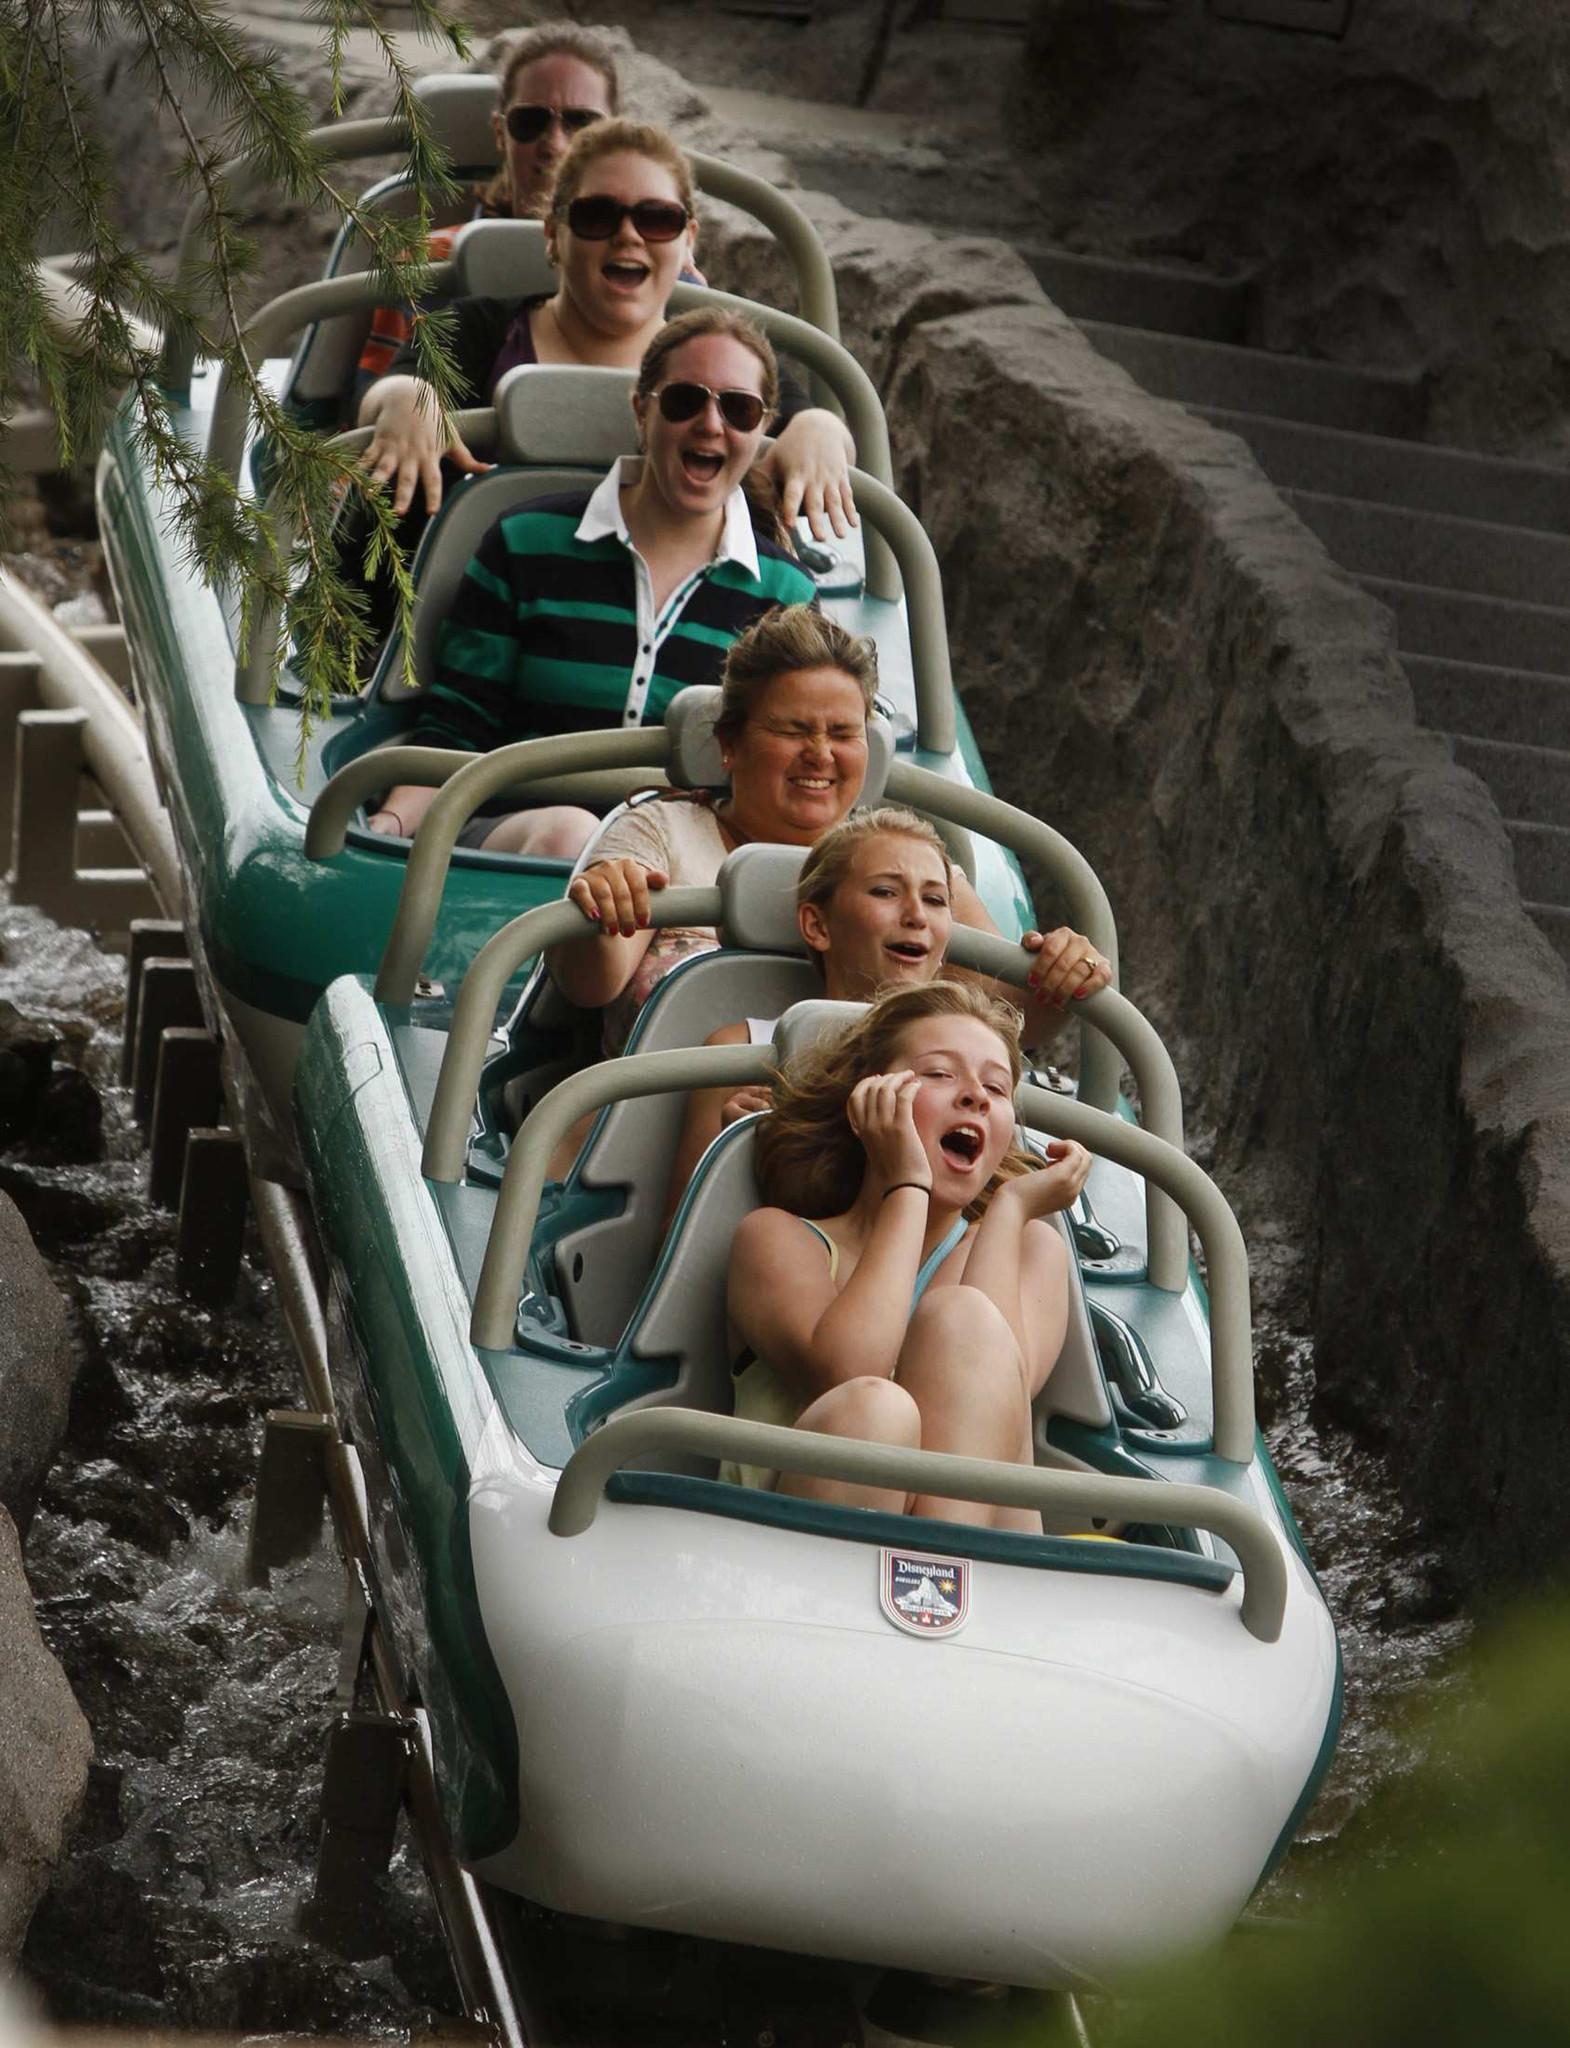 The Matterhorn reopens to the public at Disneyland after an extensive renovation June 15, 2012, in Anaheim, California.